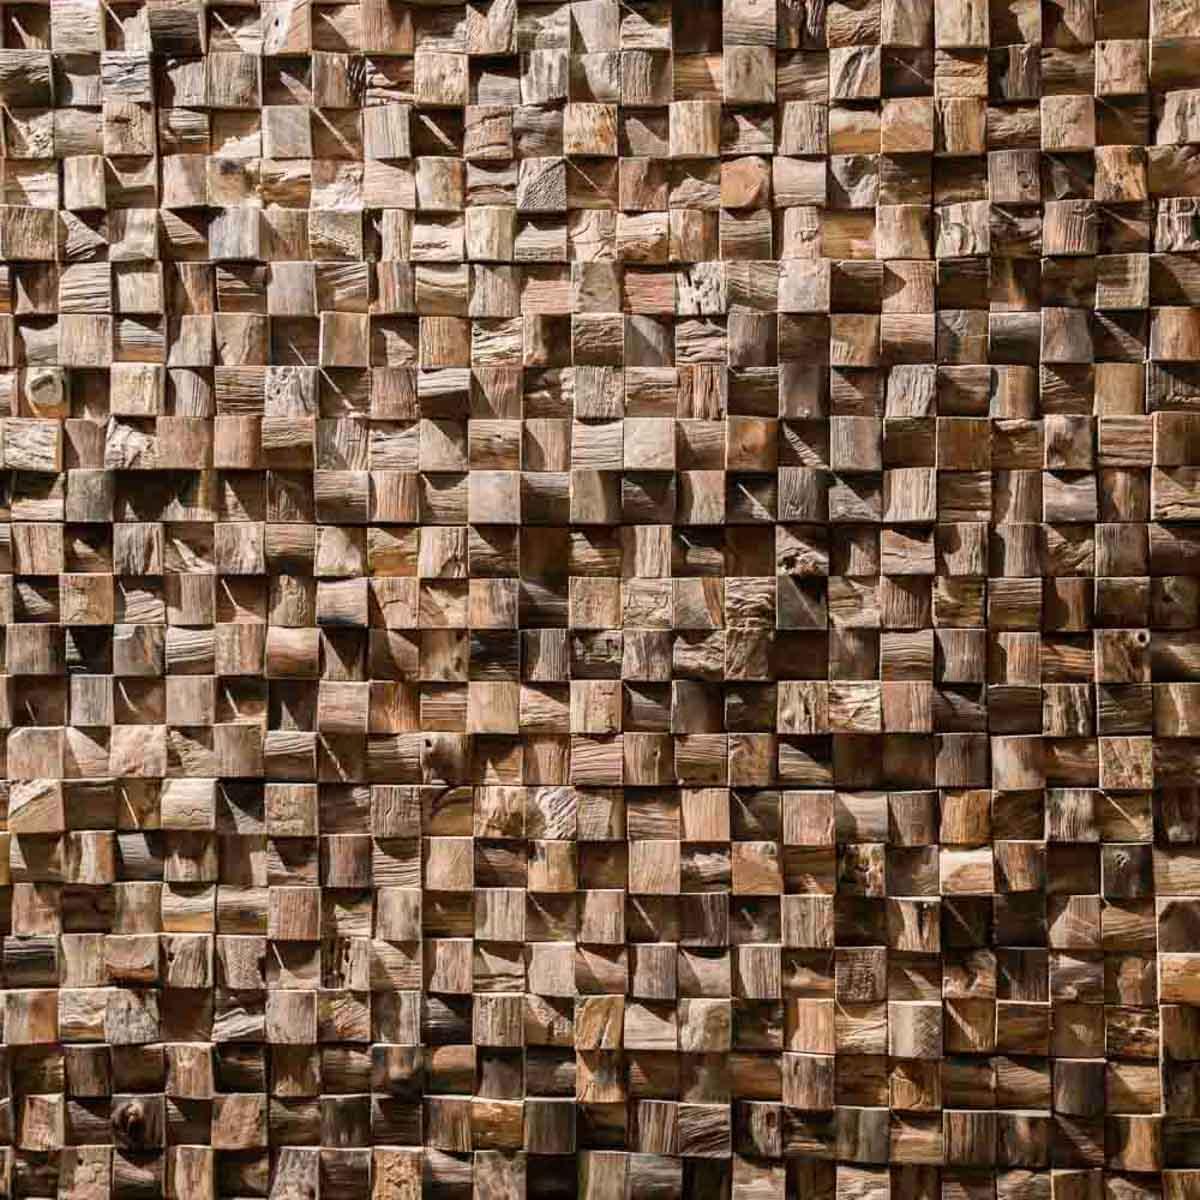 parement mosa que en teck recycl naturel carr 20cm x20cm. Black Bedroom Furniture Sets. Home Design Ideas